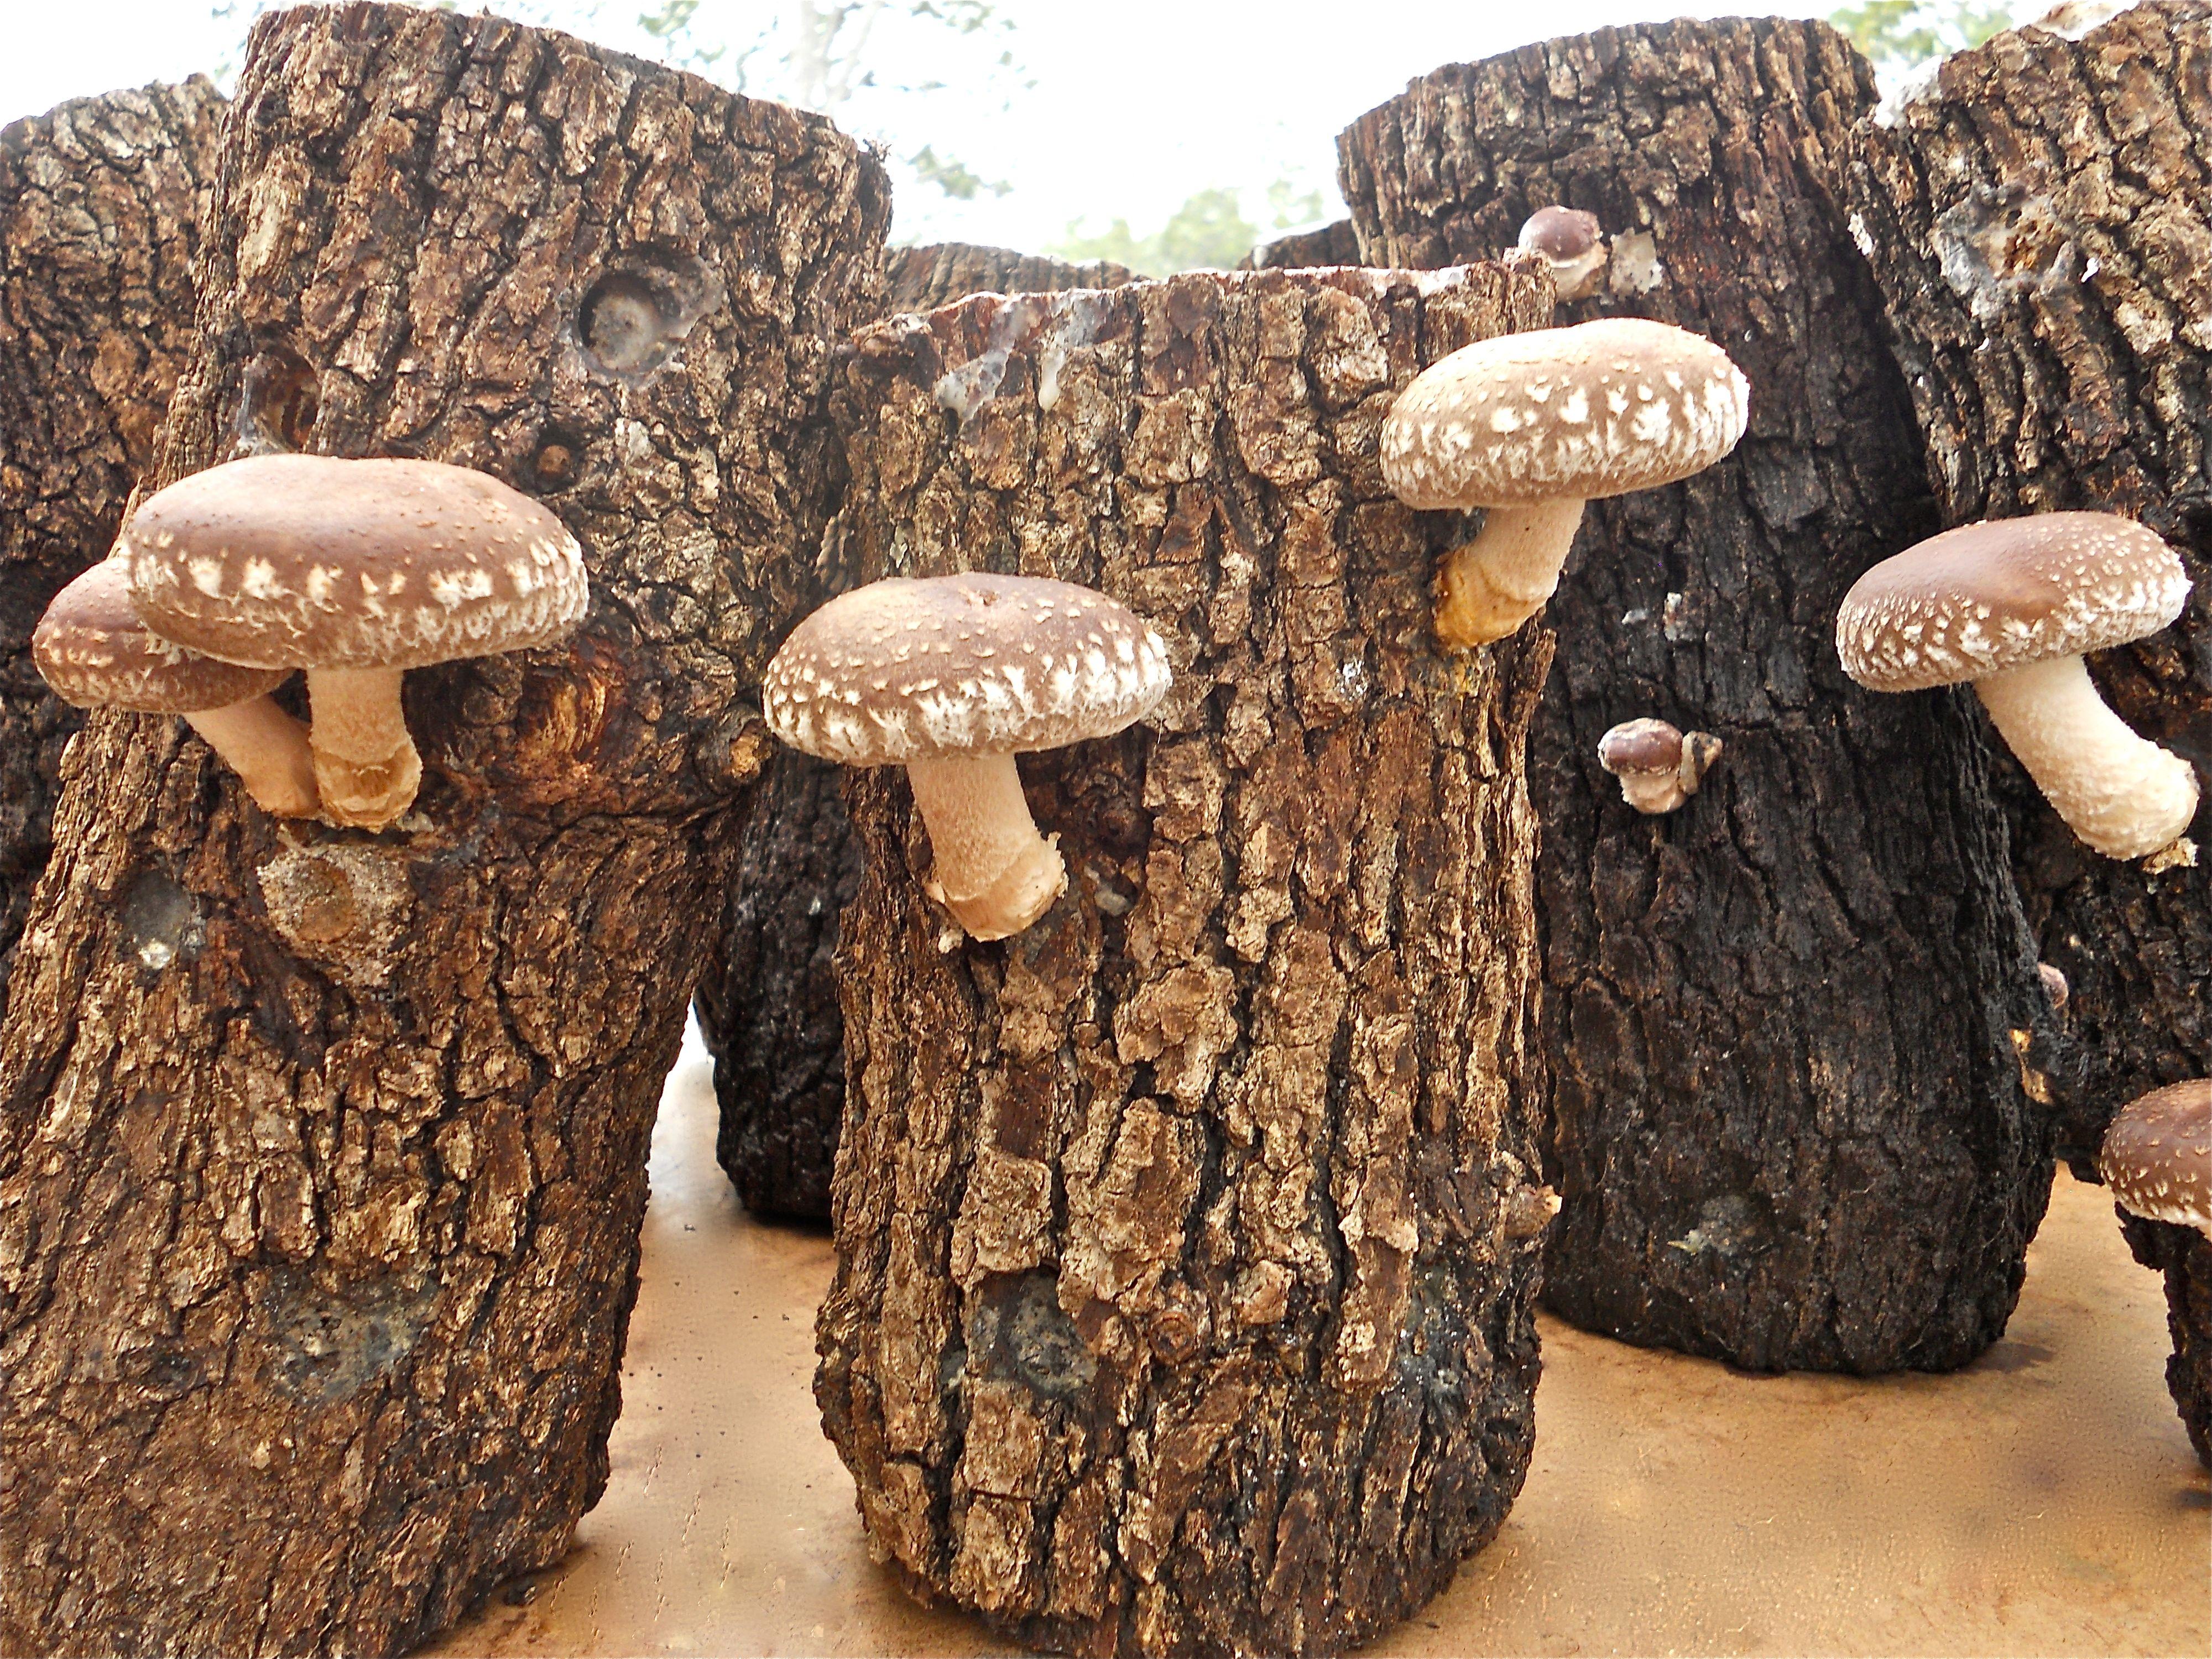 Shiitake mushrooms growing on logs from 100th Monkey